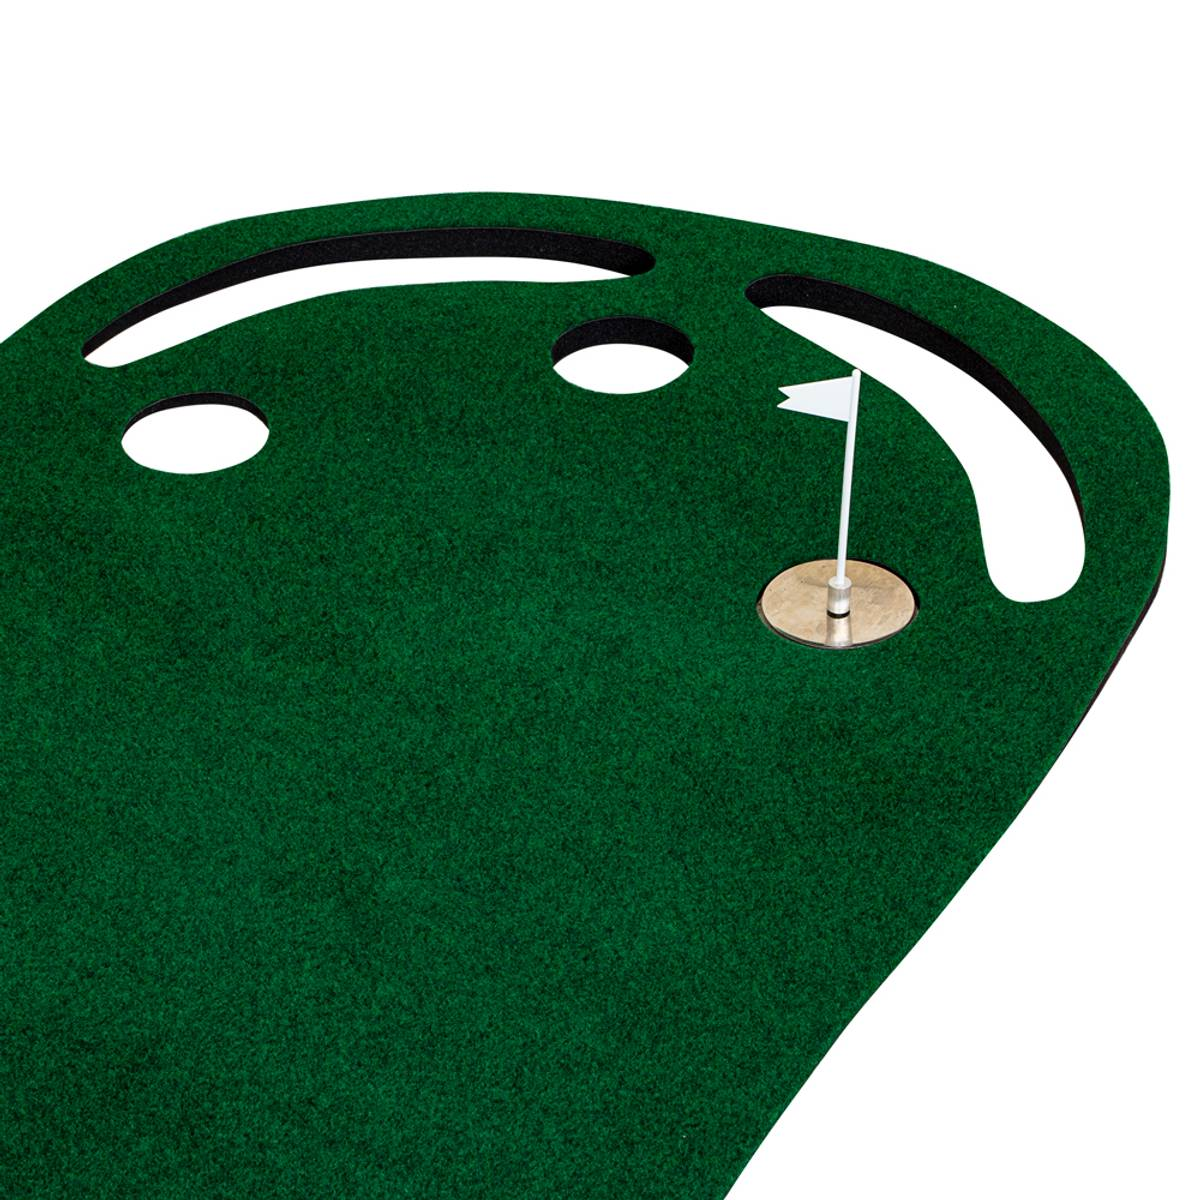 Minigolf Putting Green inSPORTline Elpit